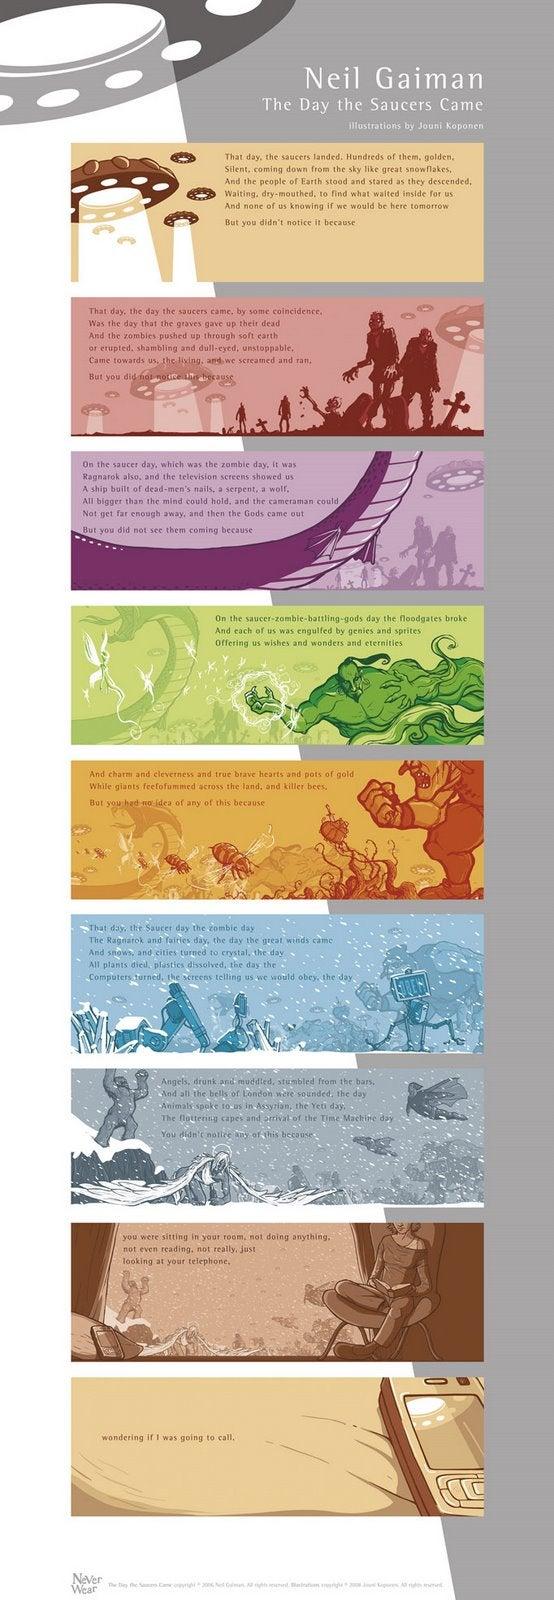 Neil Gaiman's Illustrated Multi-Pronged Apocalypse